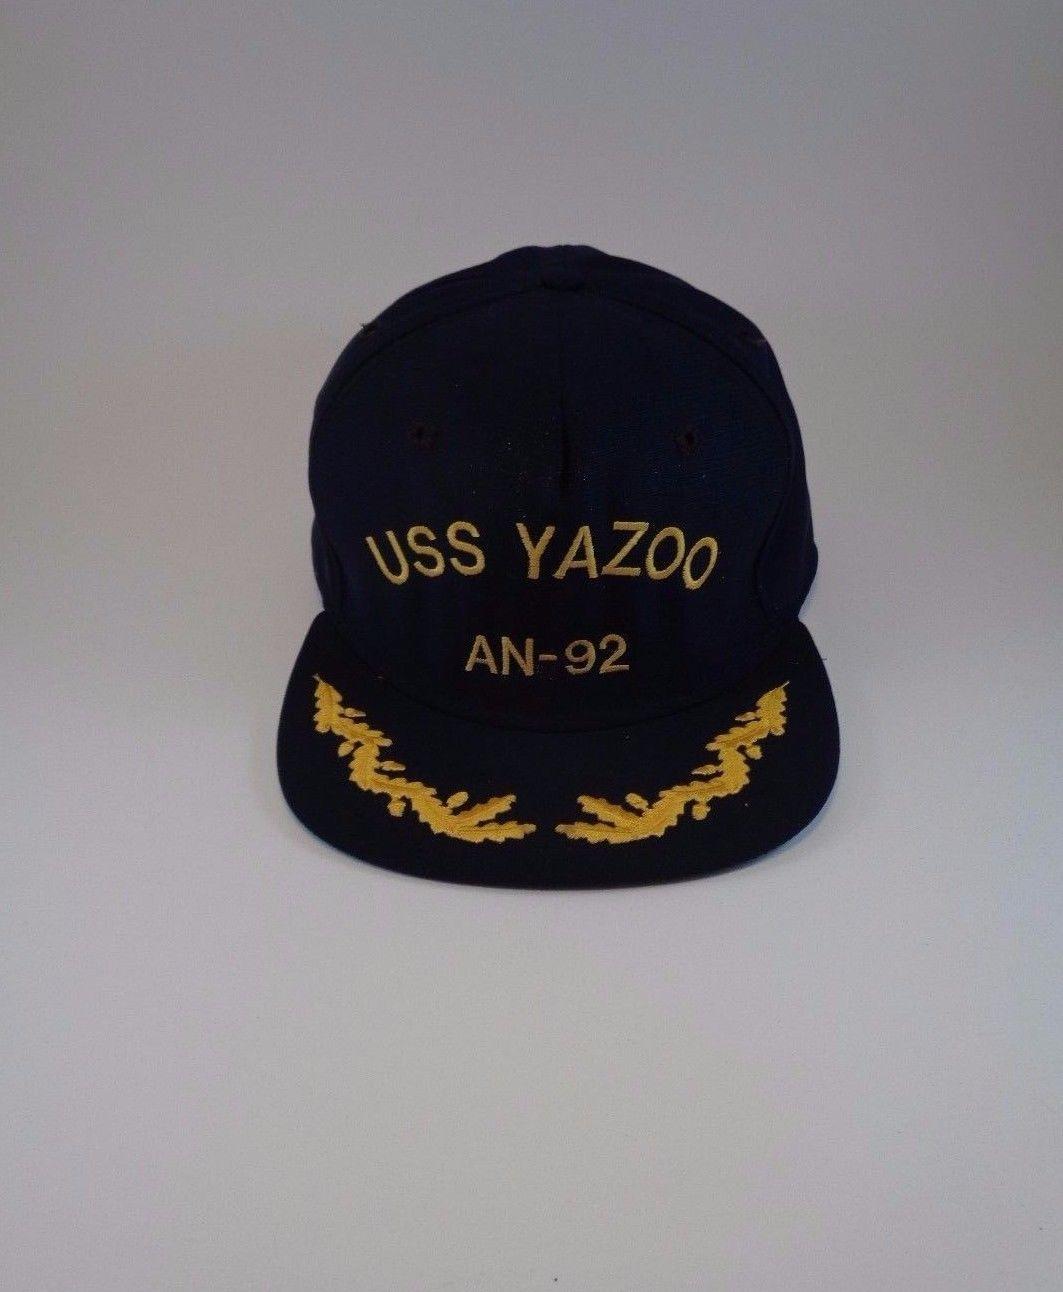 USS YAZOO AN-92 Dark Blue Black Cap Hat One Size Military Ship USN Navy